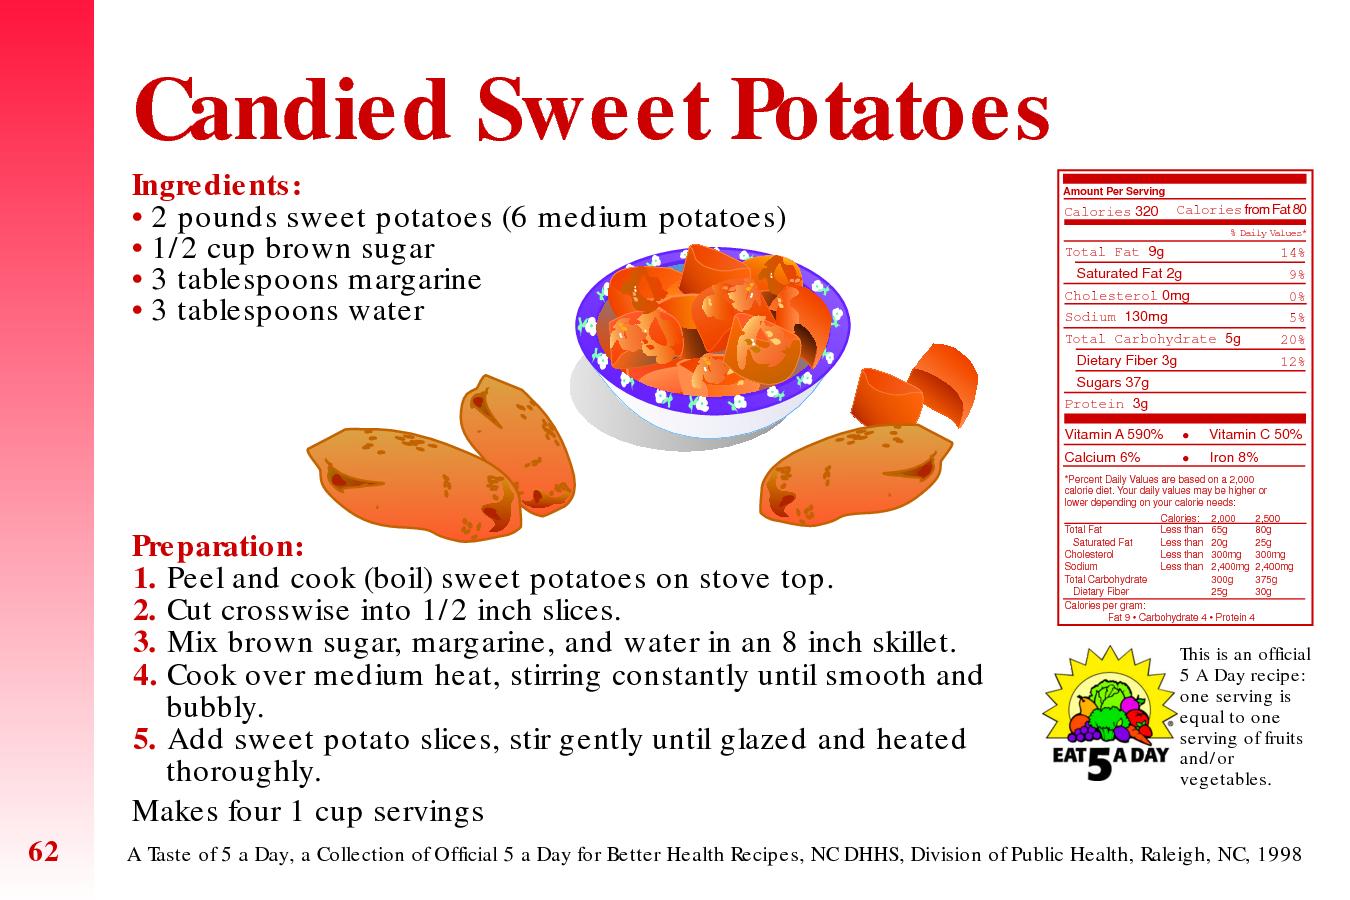 Candied Yams Recipe Soul Food Candied Yams Recipe Patti Labelle Recipes